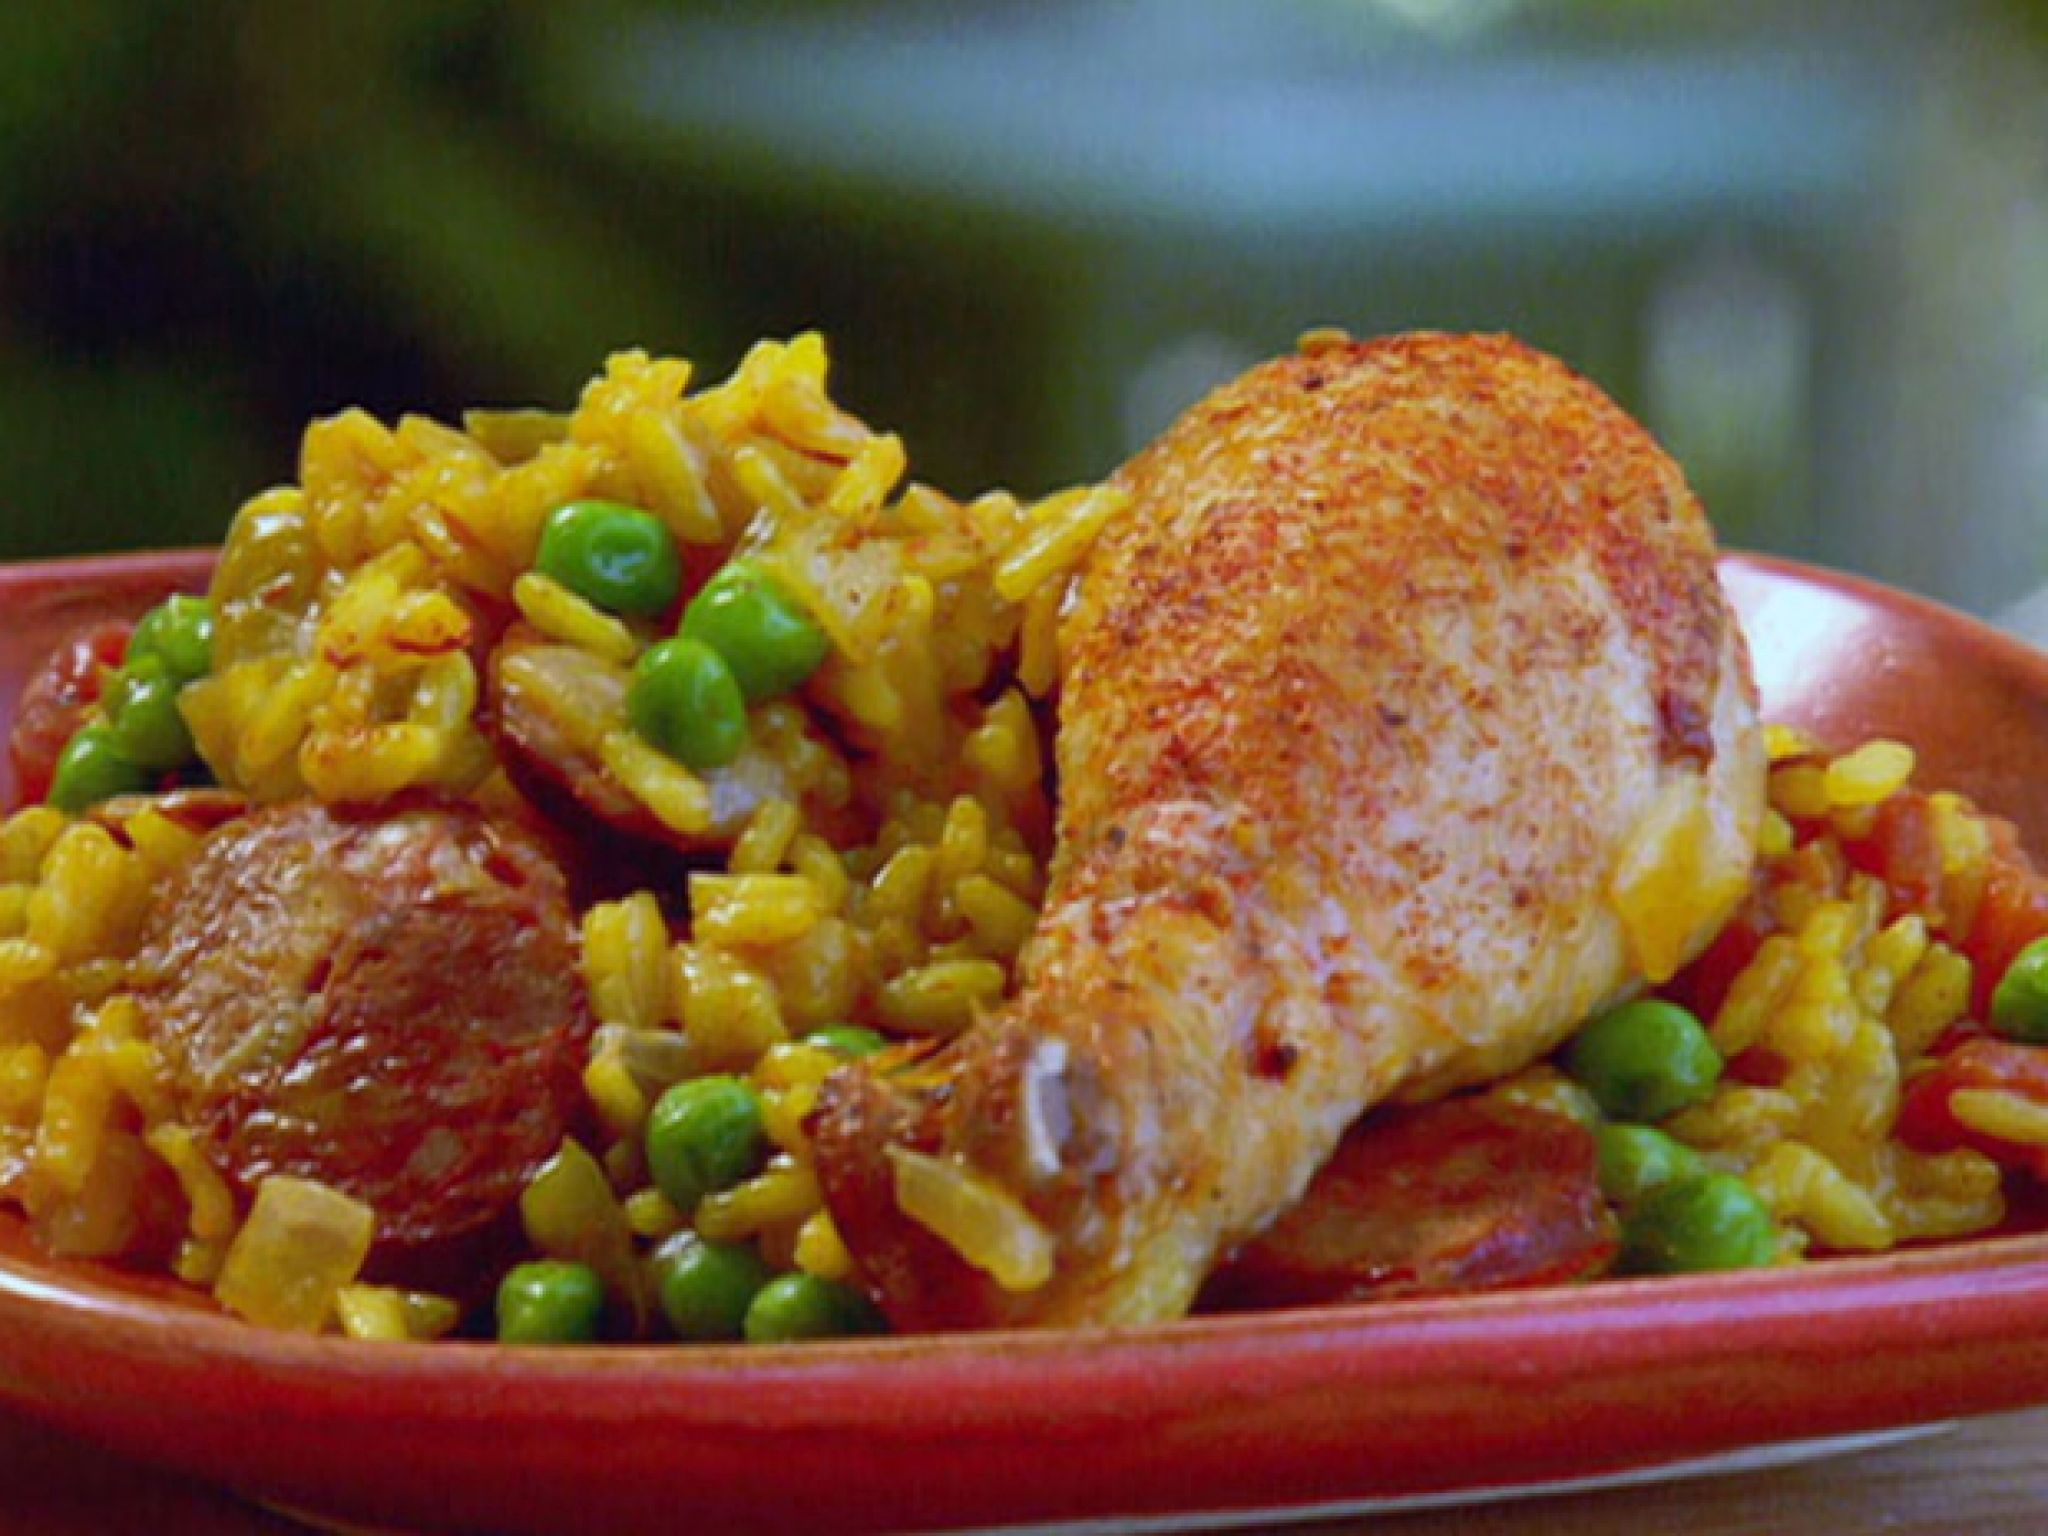 Spanish chicken and chorizo paella recipe pinterest spanish spanish chicken and chorizo paella recipe pinterest spanish chicken paella and paula deen forumfinder Images